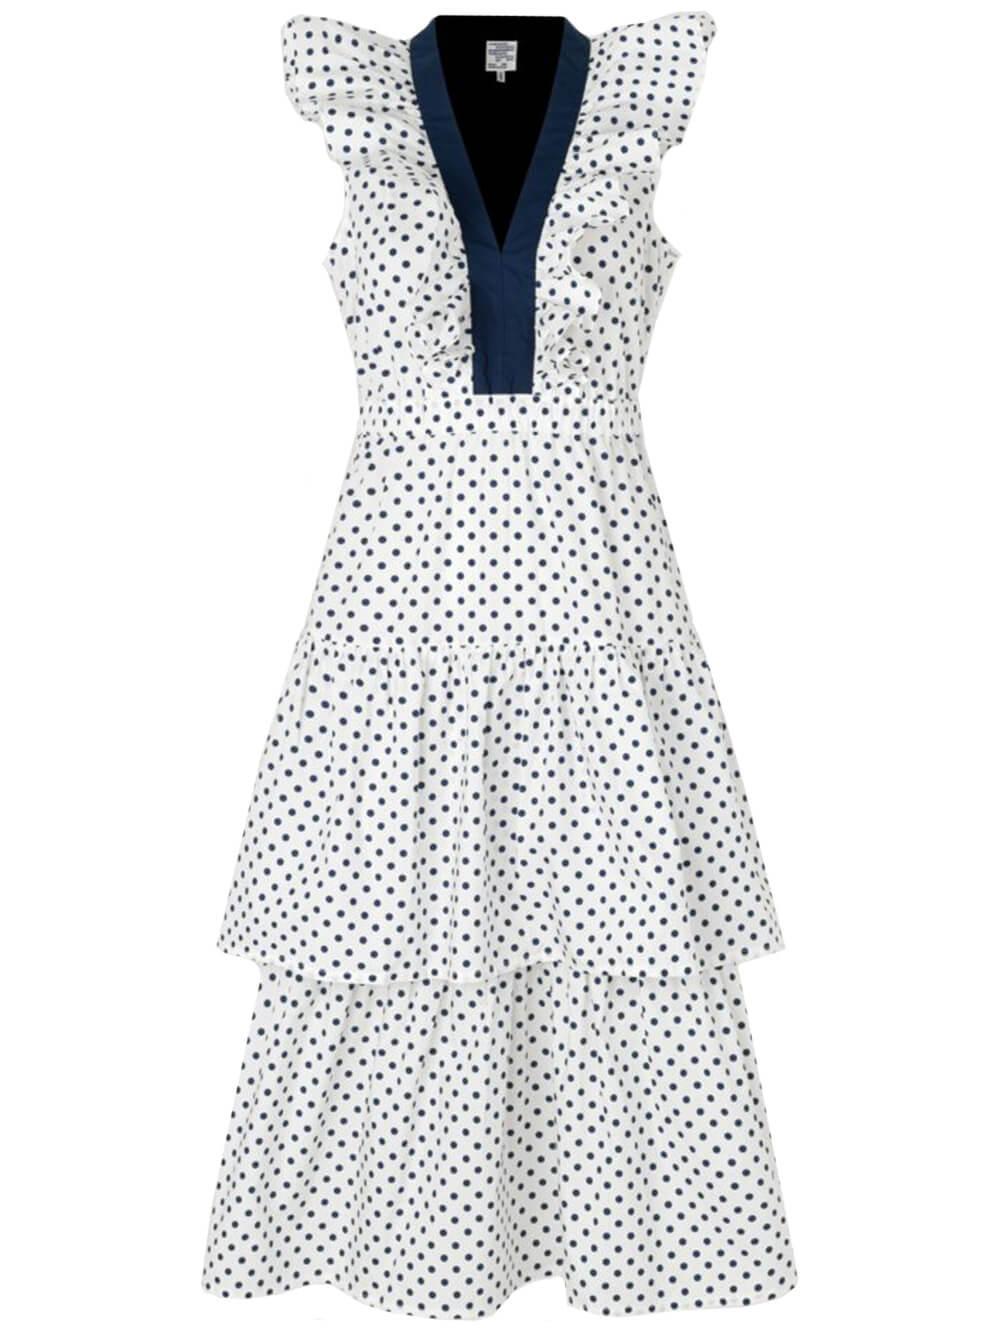 Avaleen Dress Item # 21572